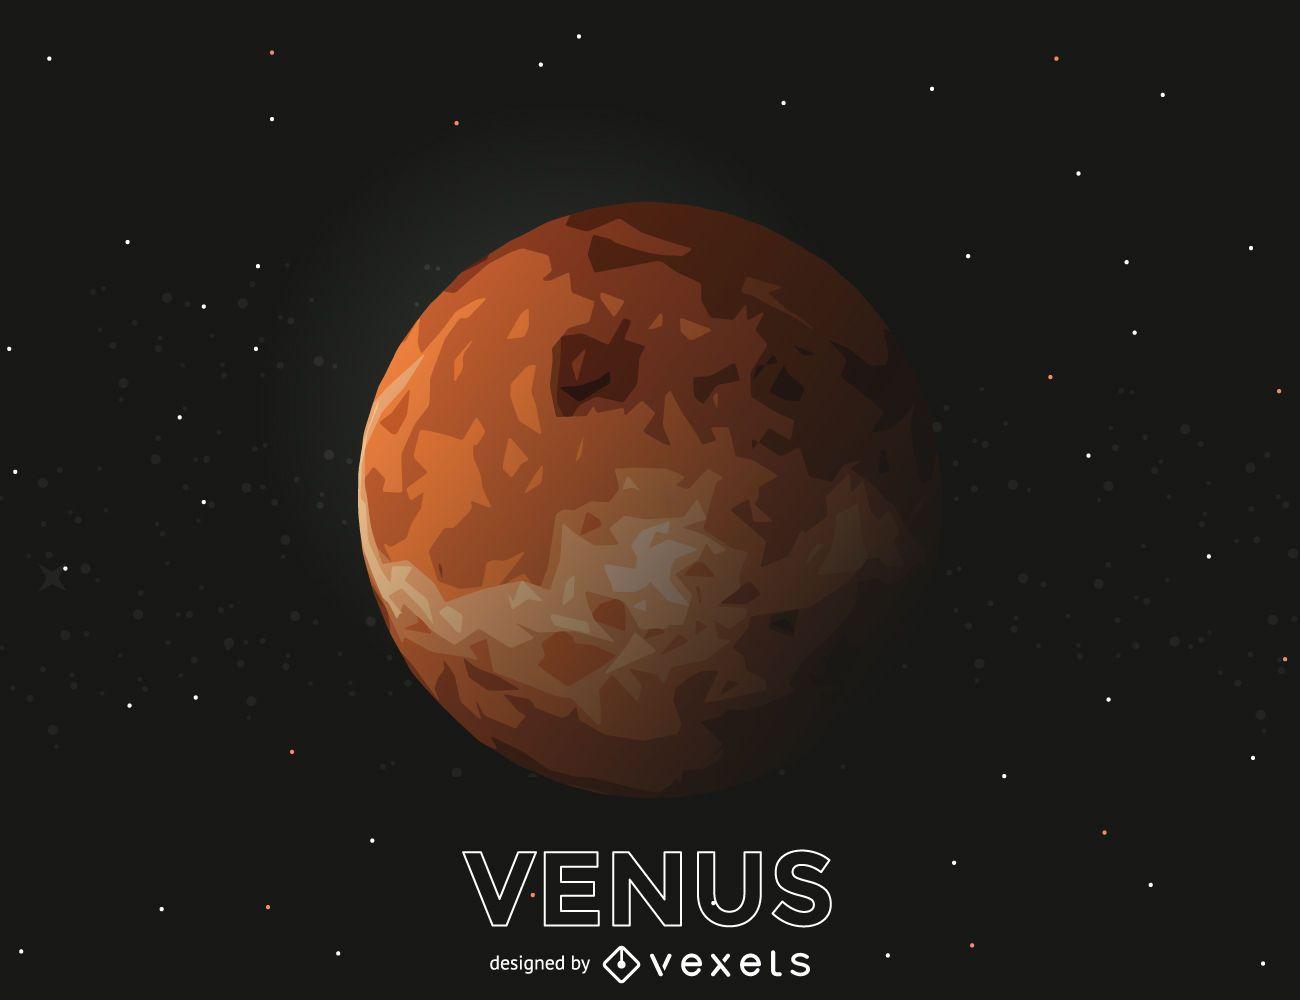 Venus planet cutout illustration